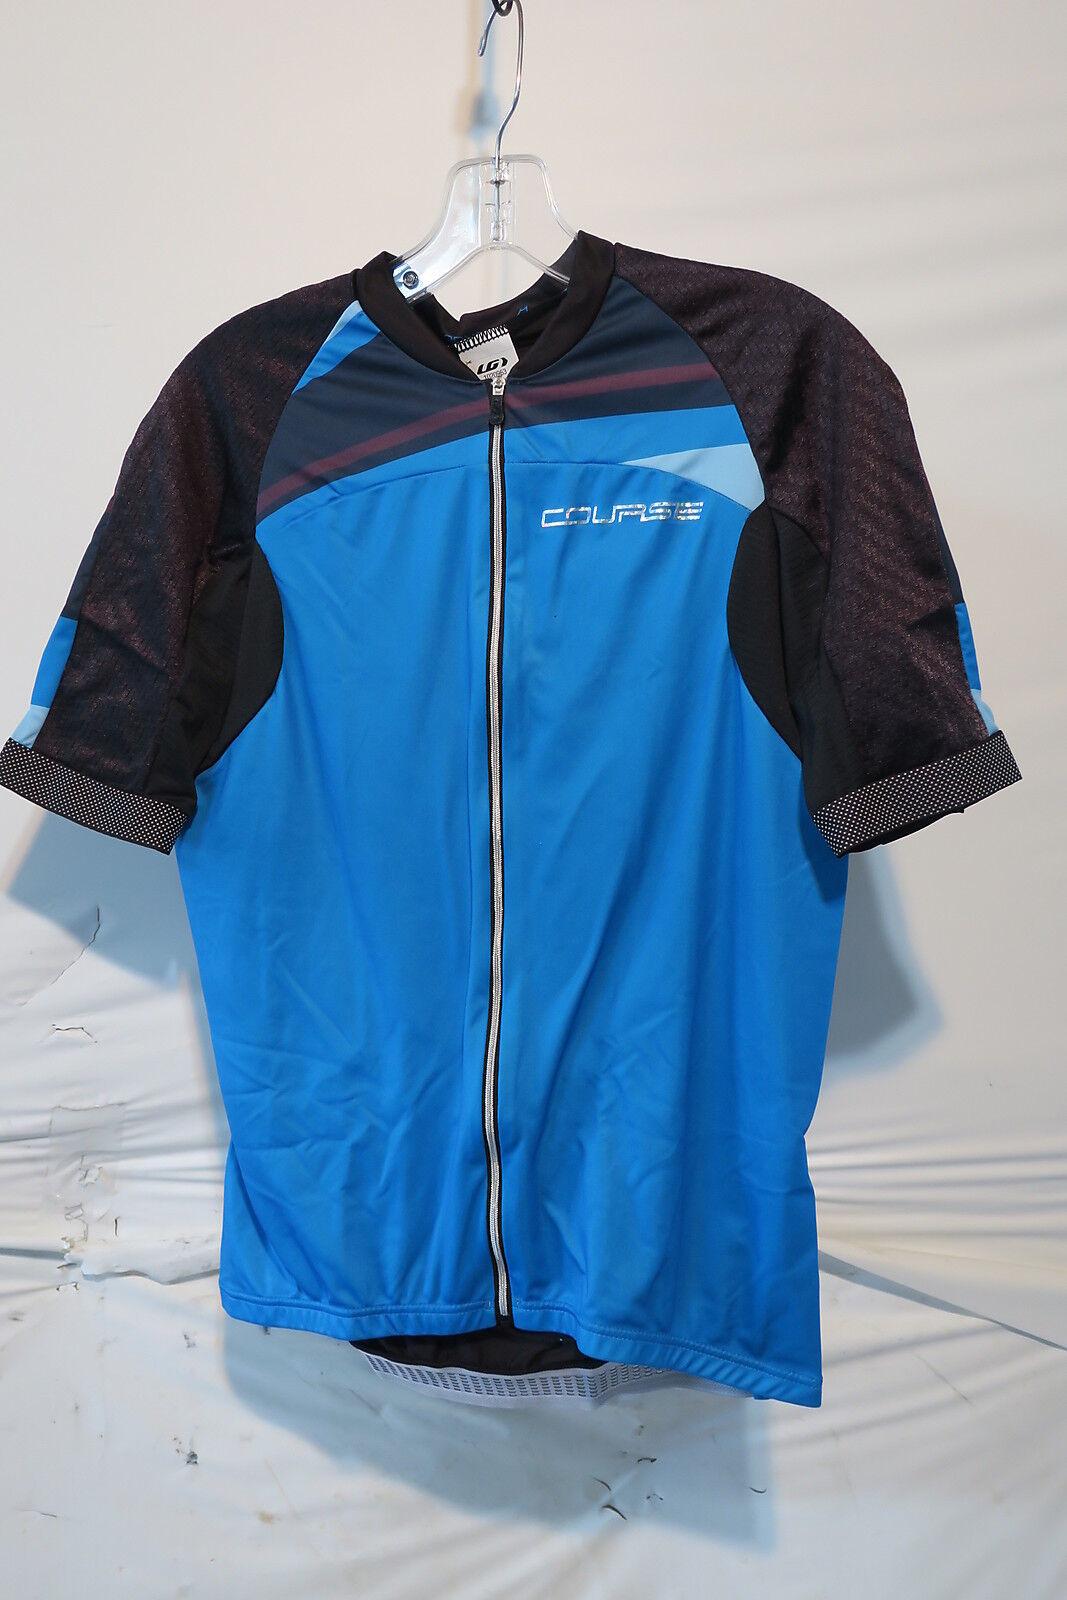 Louis Garneau Elite M-2 Cycling Jersey Men's Large Course bluee Retail  149.99